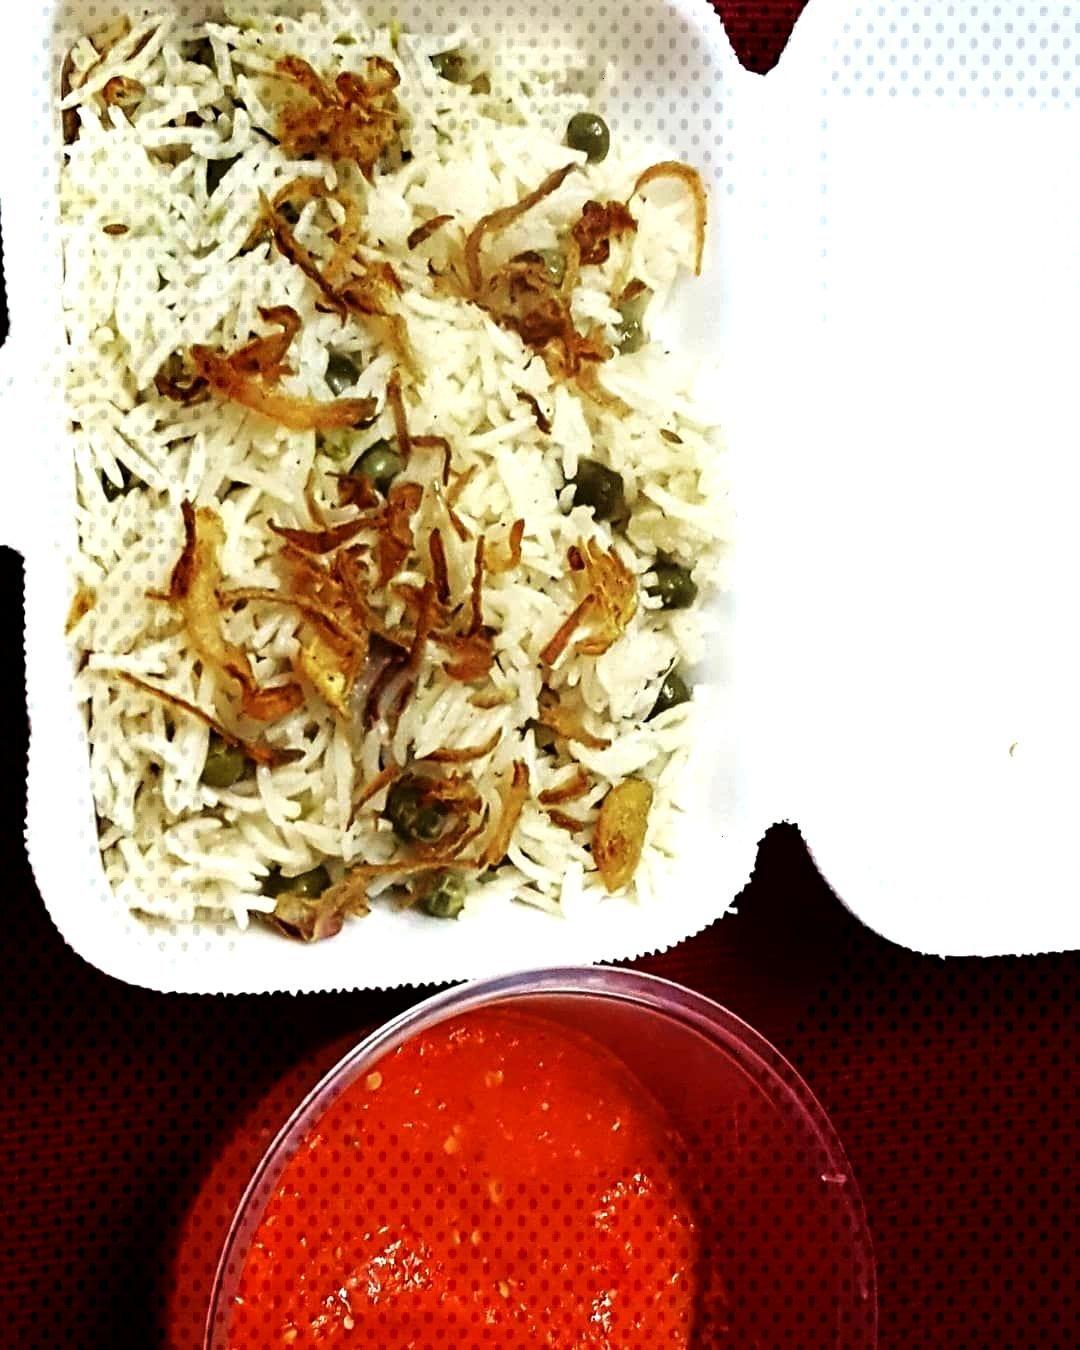 Muttar pulao with Tomato Chuttni For order plz inbox